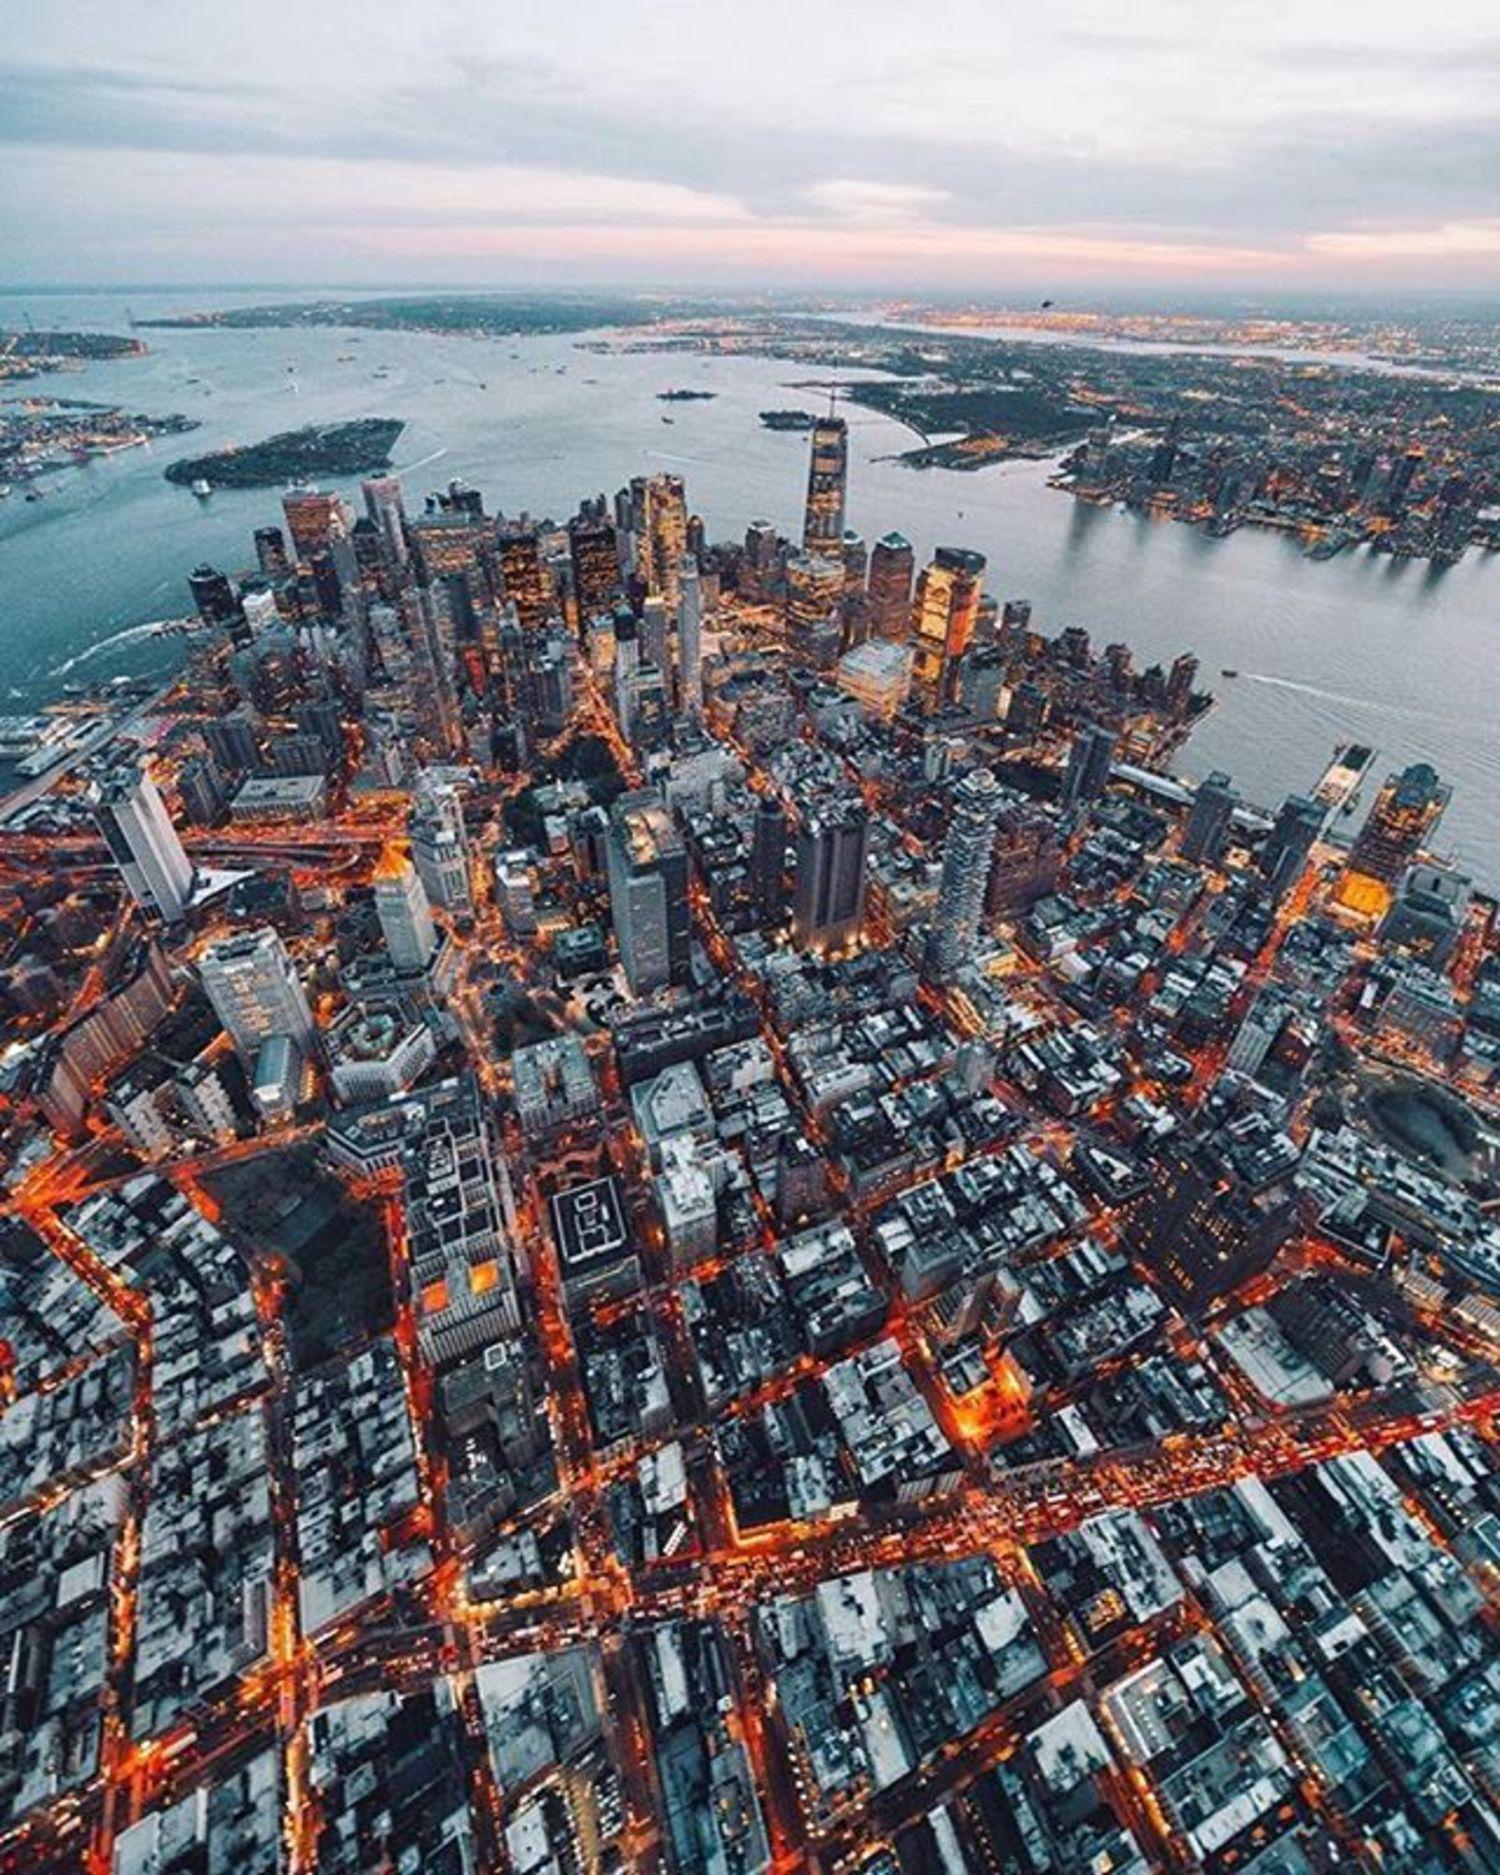 New York, New York. Photo via @svvvk #viewingnyc #newyork #newyorkcity #nyc